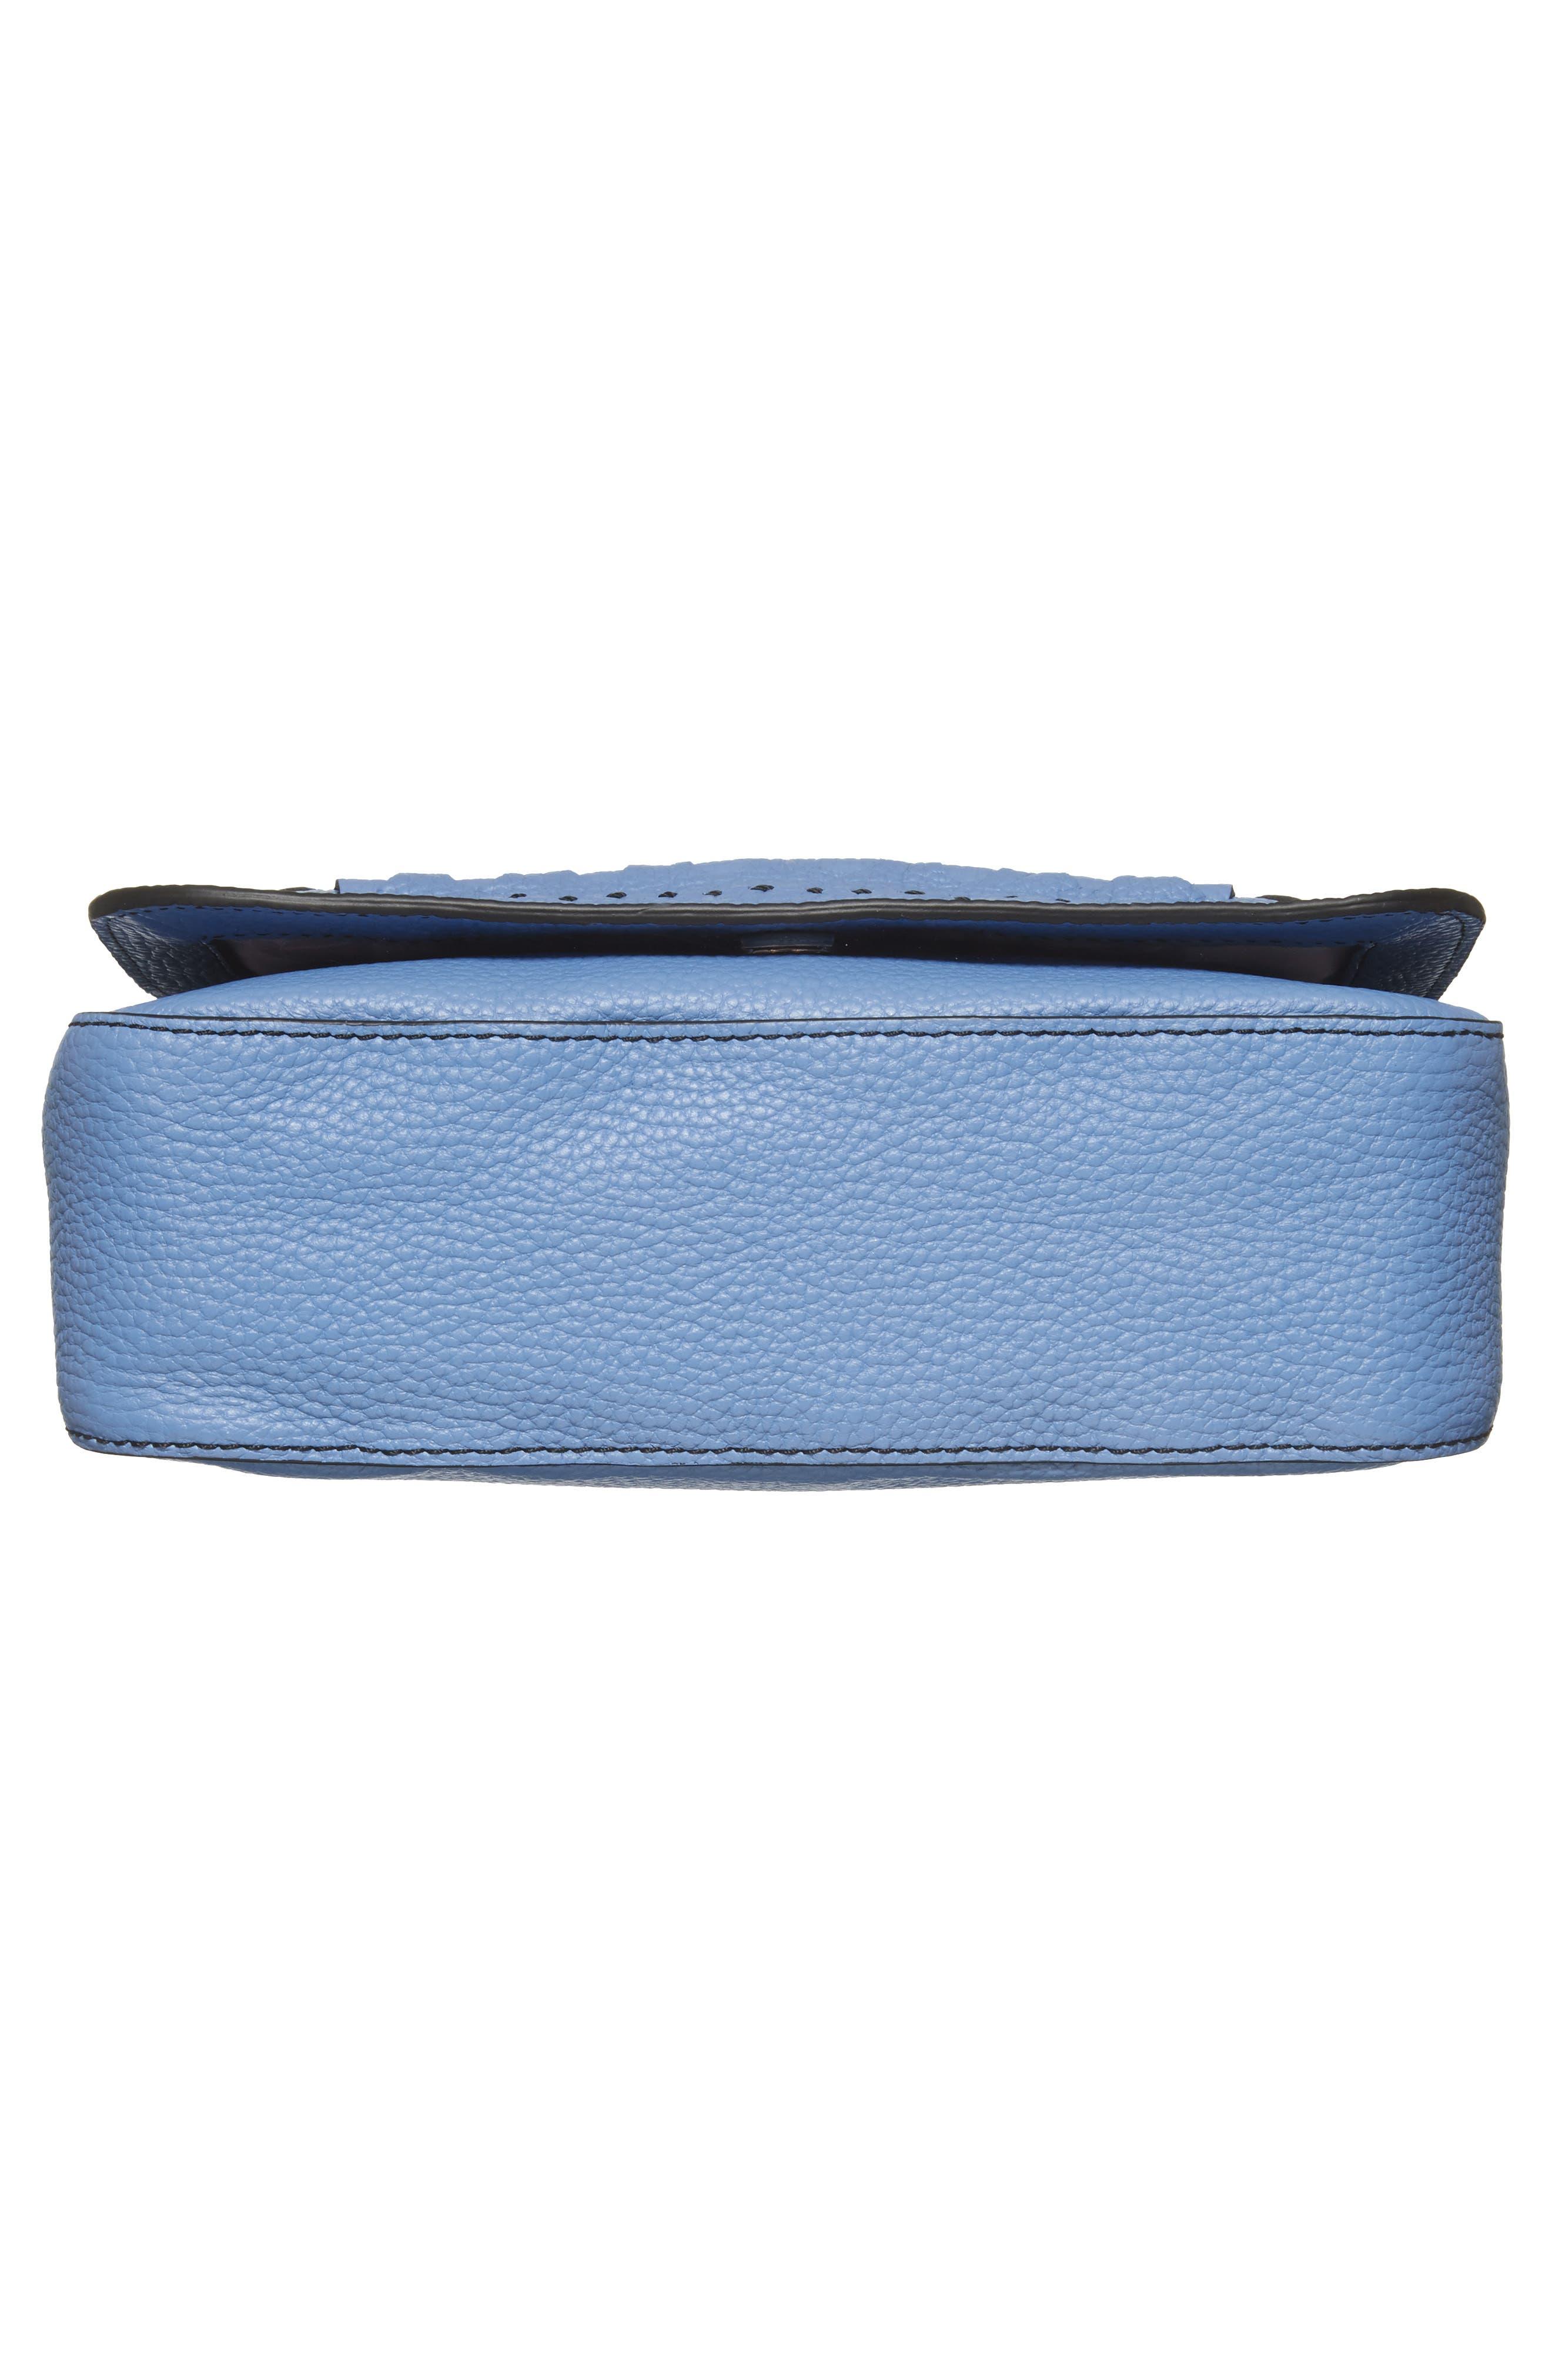 Tippi Leather Crossbody Bag,                             Alternate thumbnail 17, color,